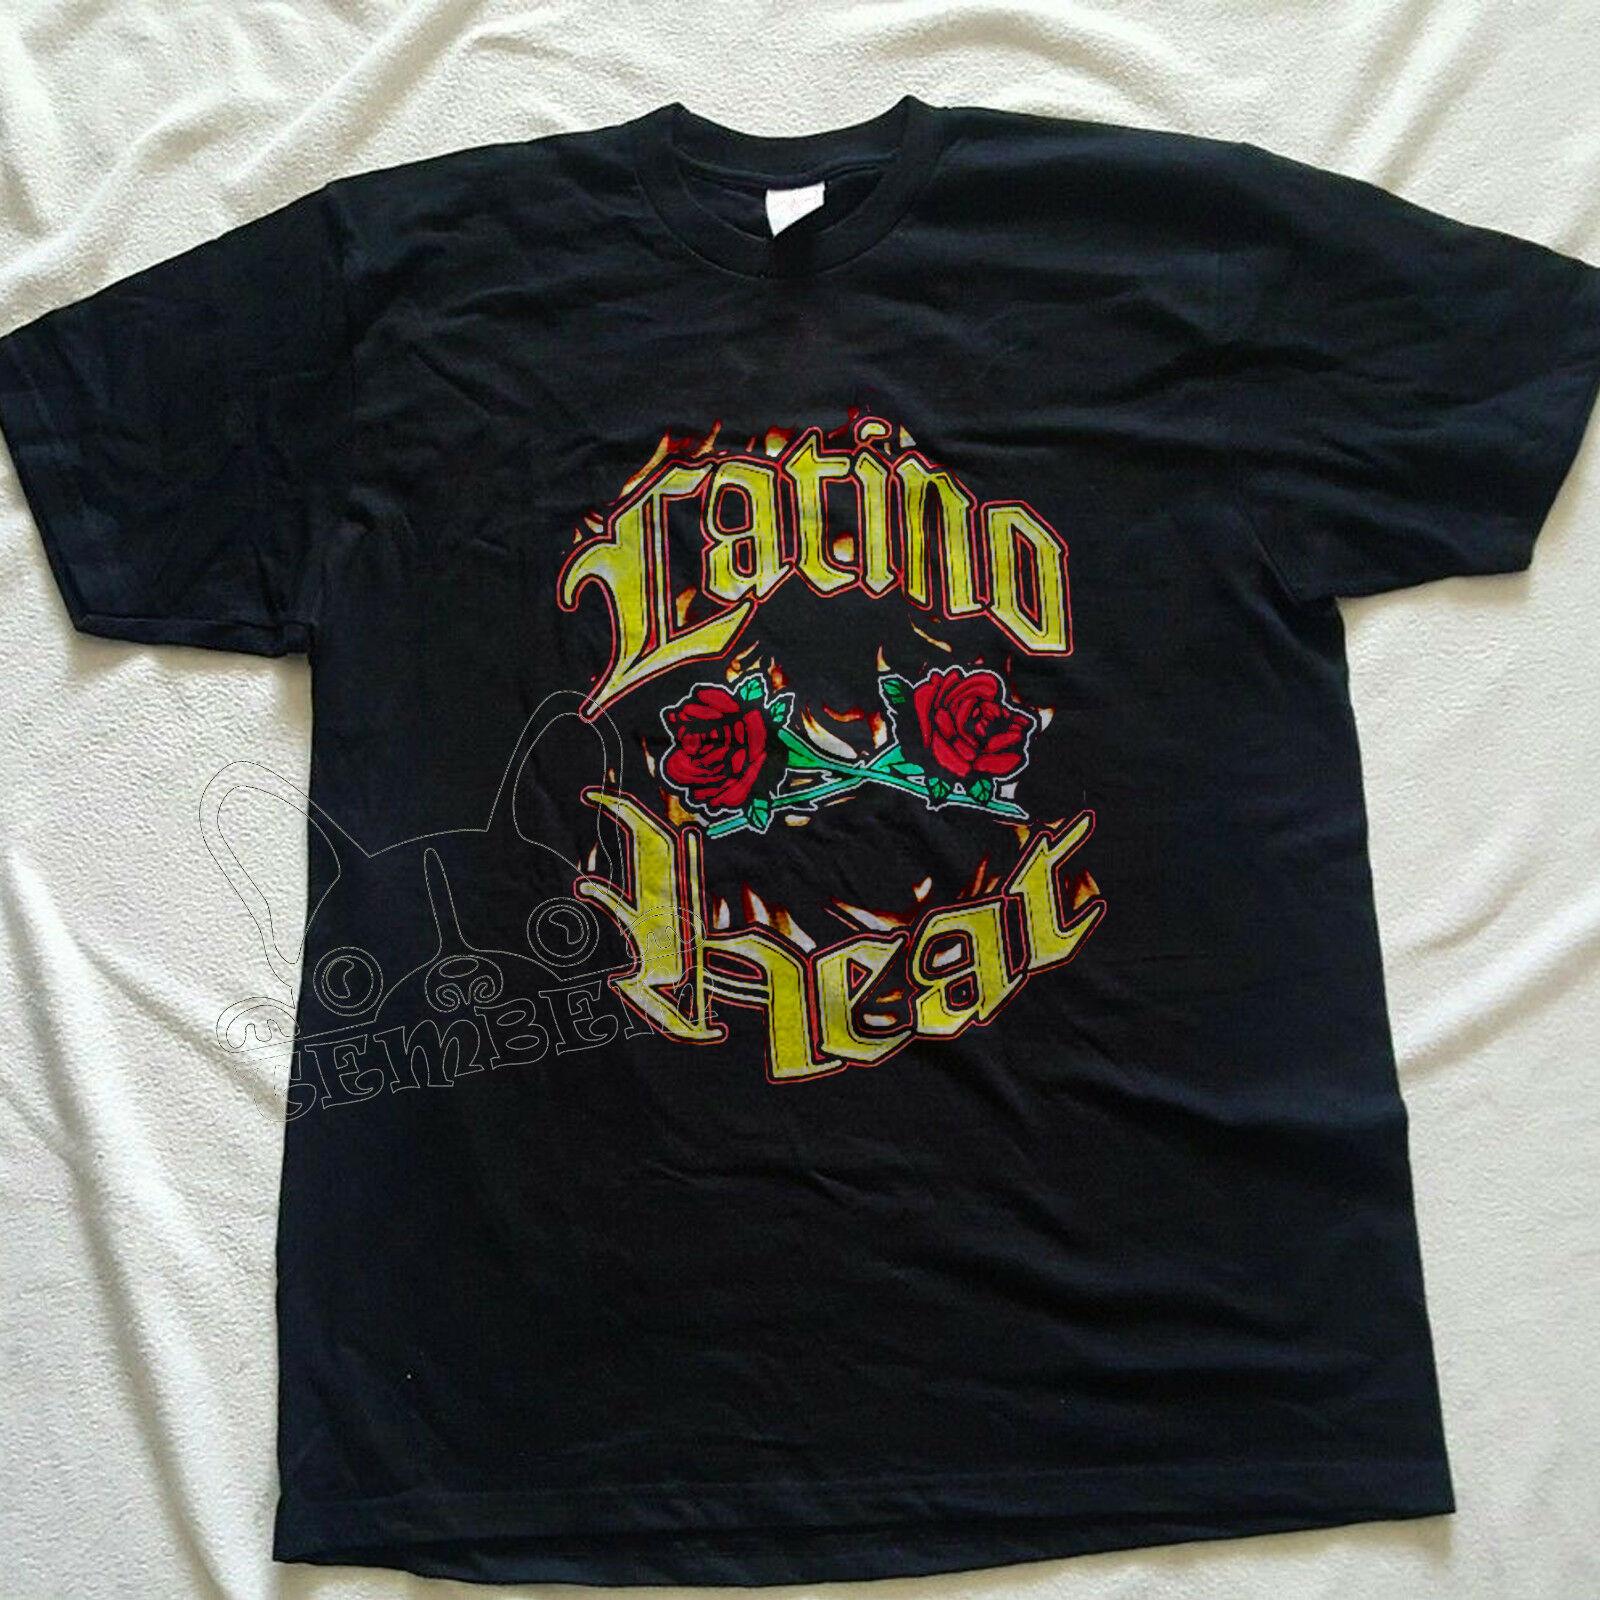 Vintageharajuku Streetwear Shirt Menlatino Heat Wwf Eddie Guerrero Reprint Shirt S Xxl(China)